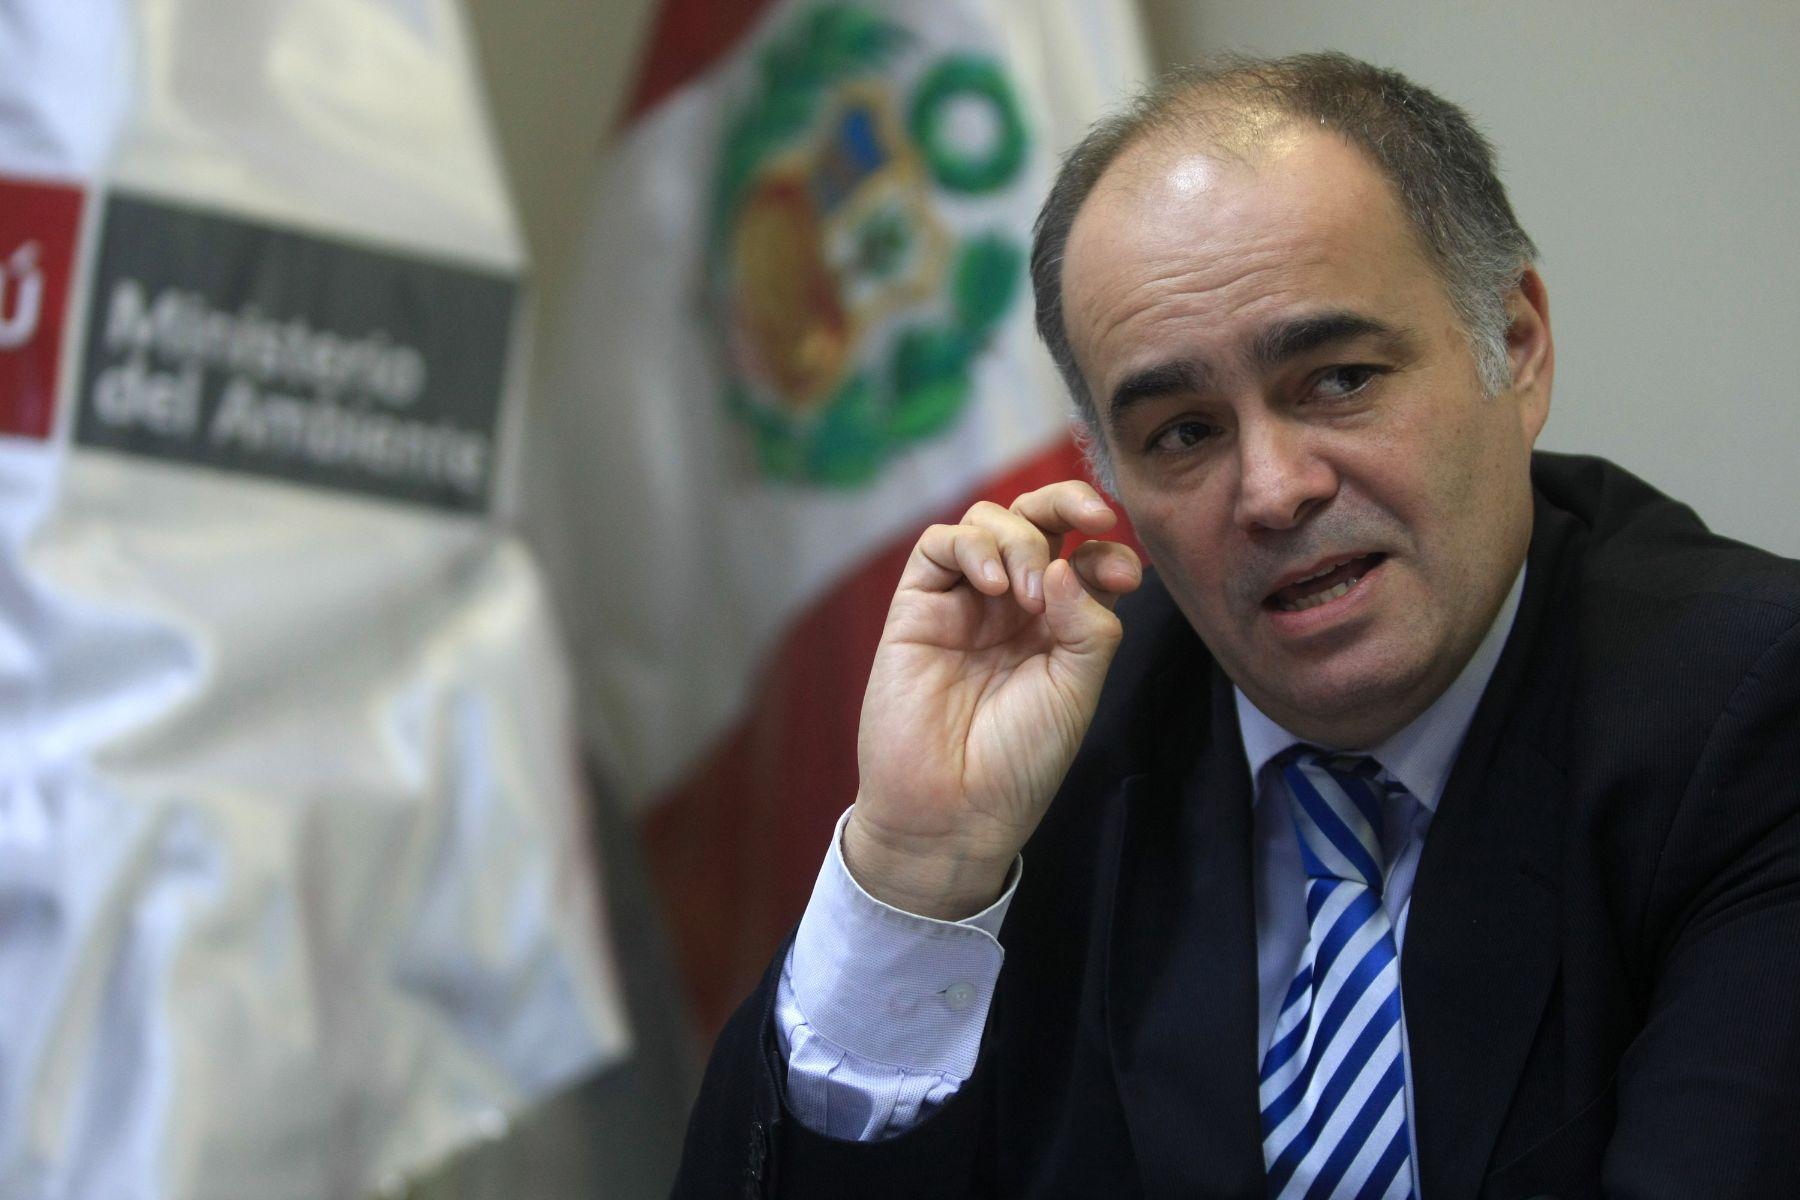 Gabriel Quijandria, Deputy Minister for Strategic Development of Natural Resources of Peru